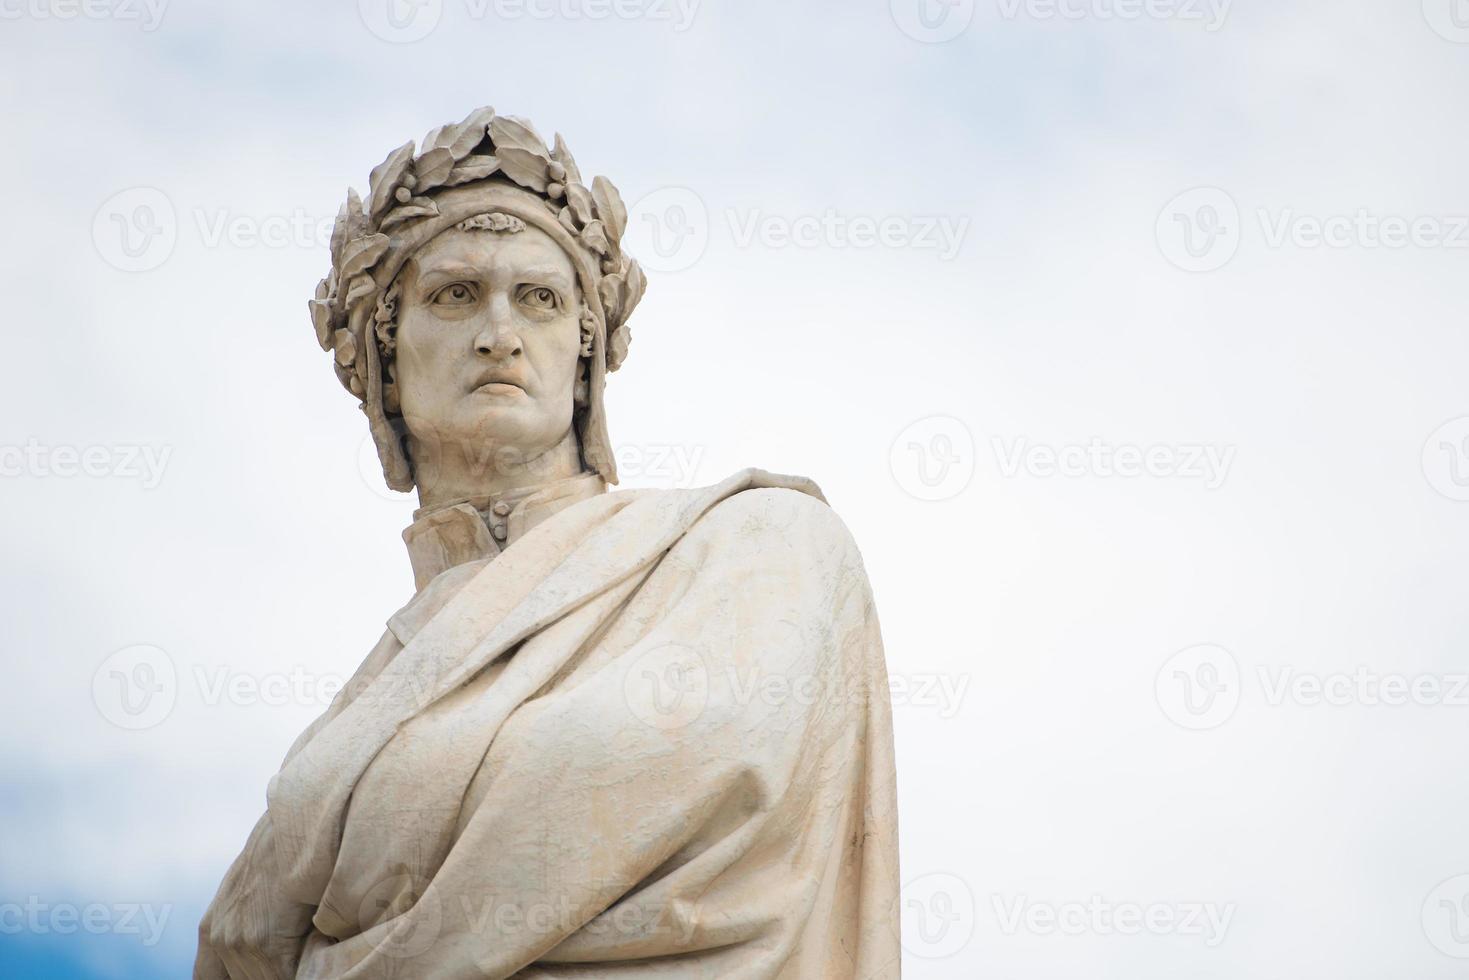 Statue von Dante Alighieri in Florenz, Italien foto